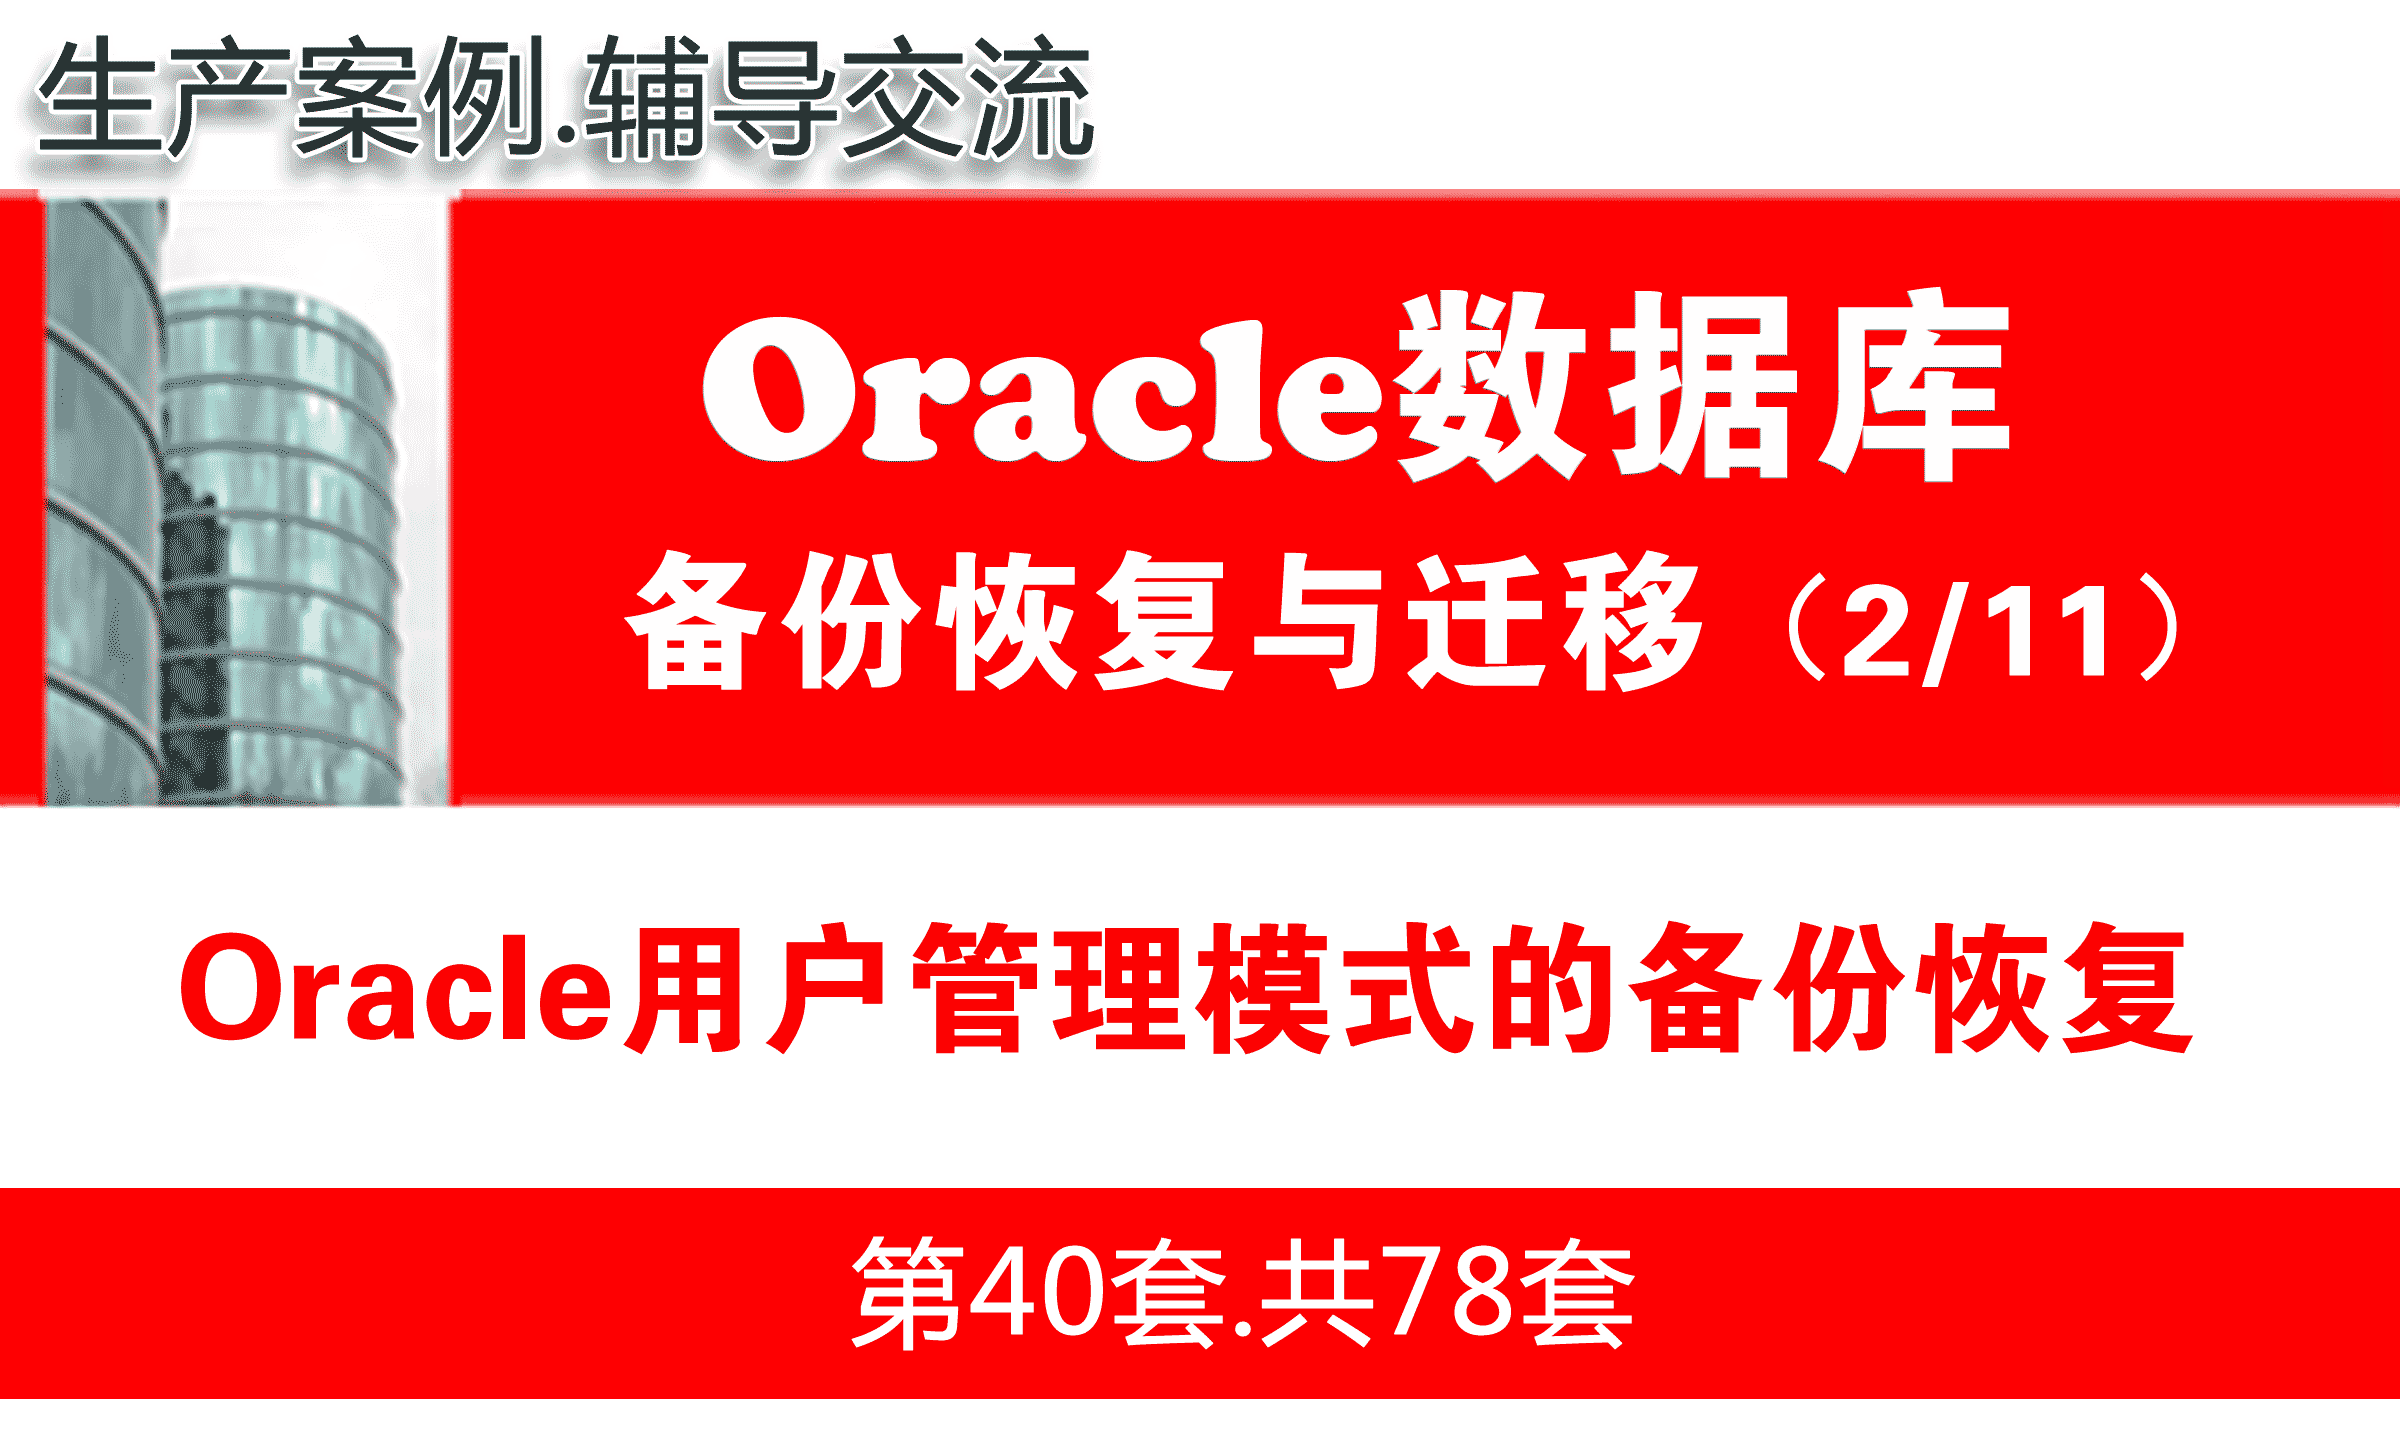 Oracle用户管理模式的备份恢复_Oracle备份恢复与数据迁移教程02